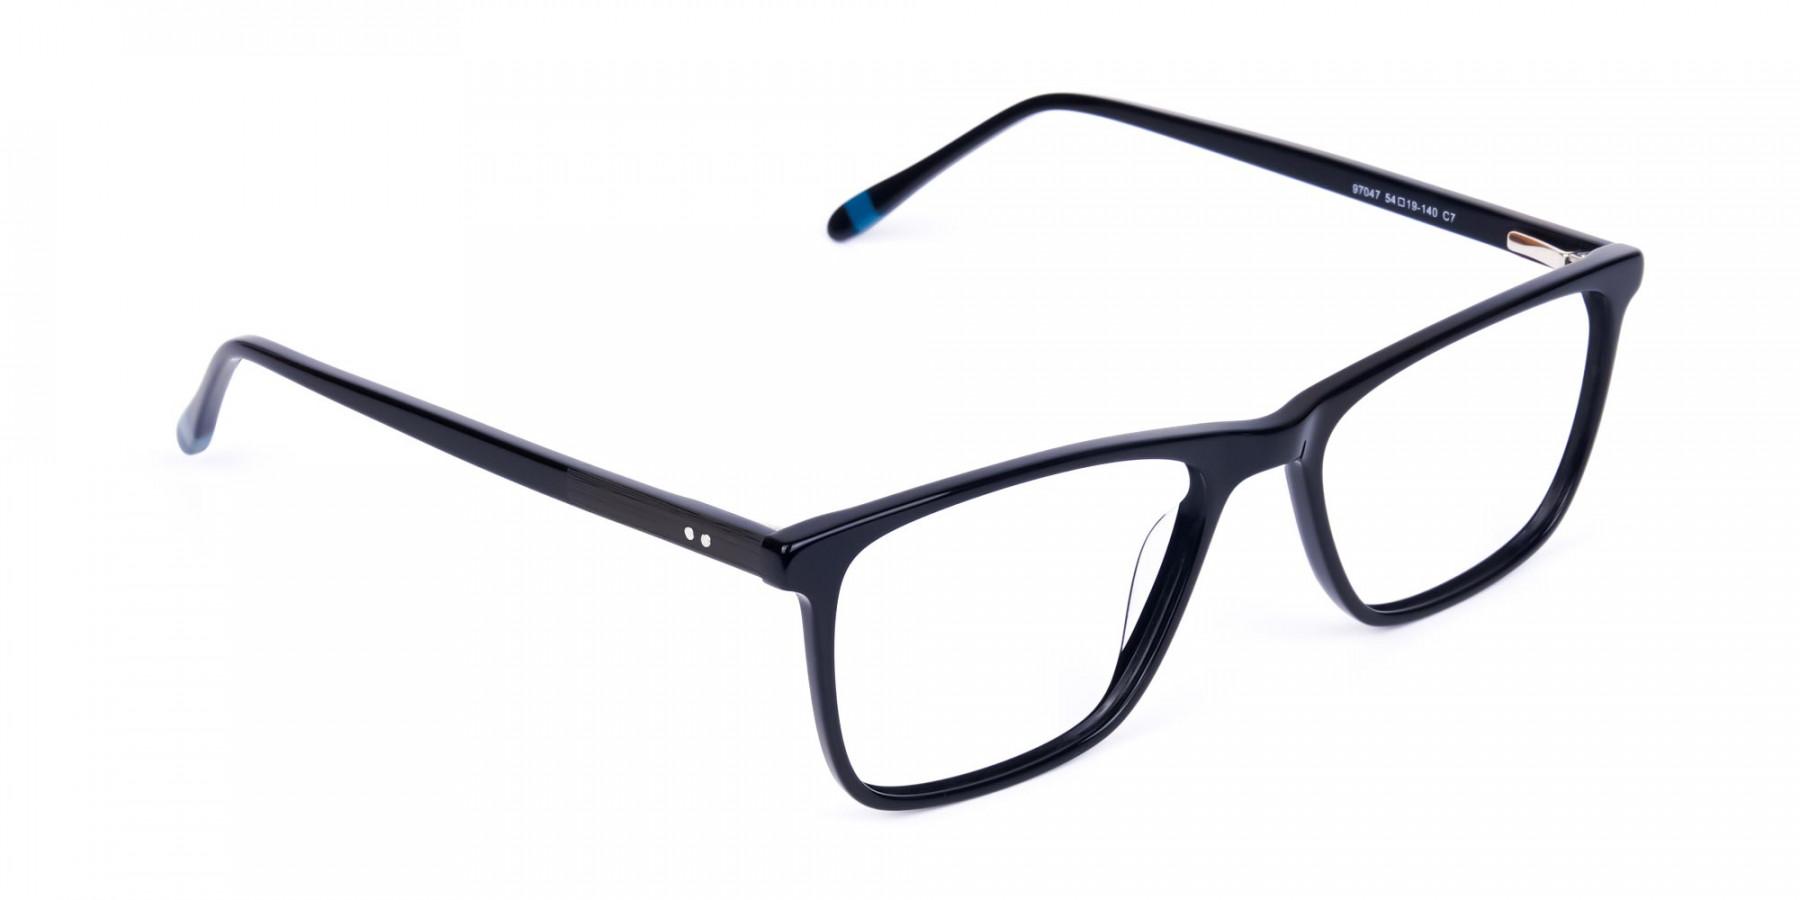 Teal-and-Black-Rectangle-Eyeglasses-1